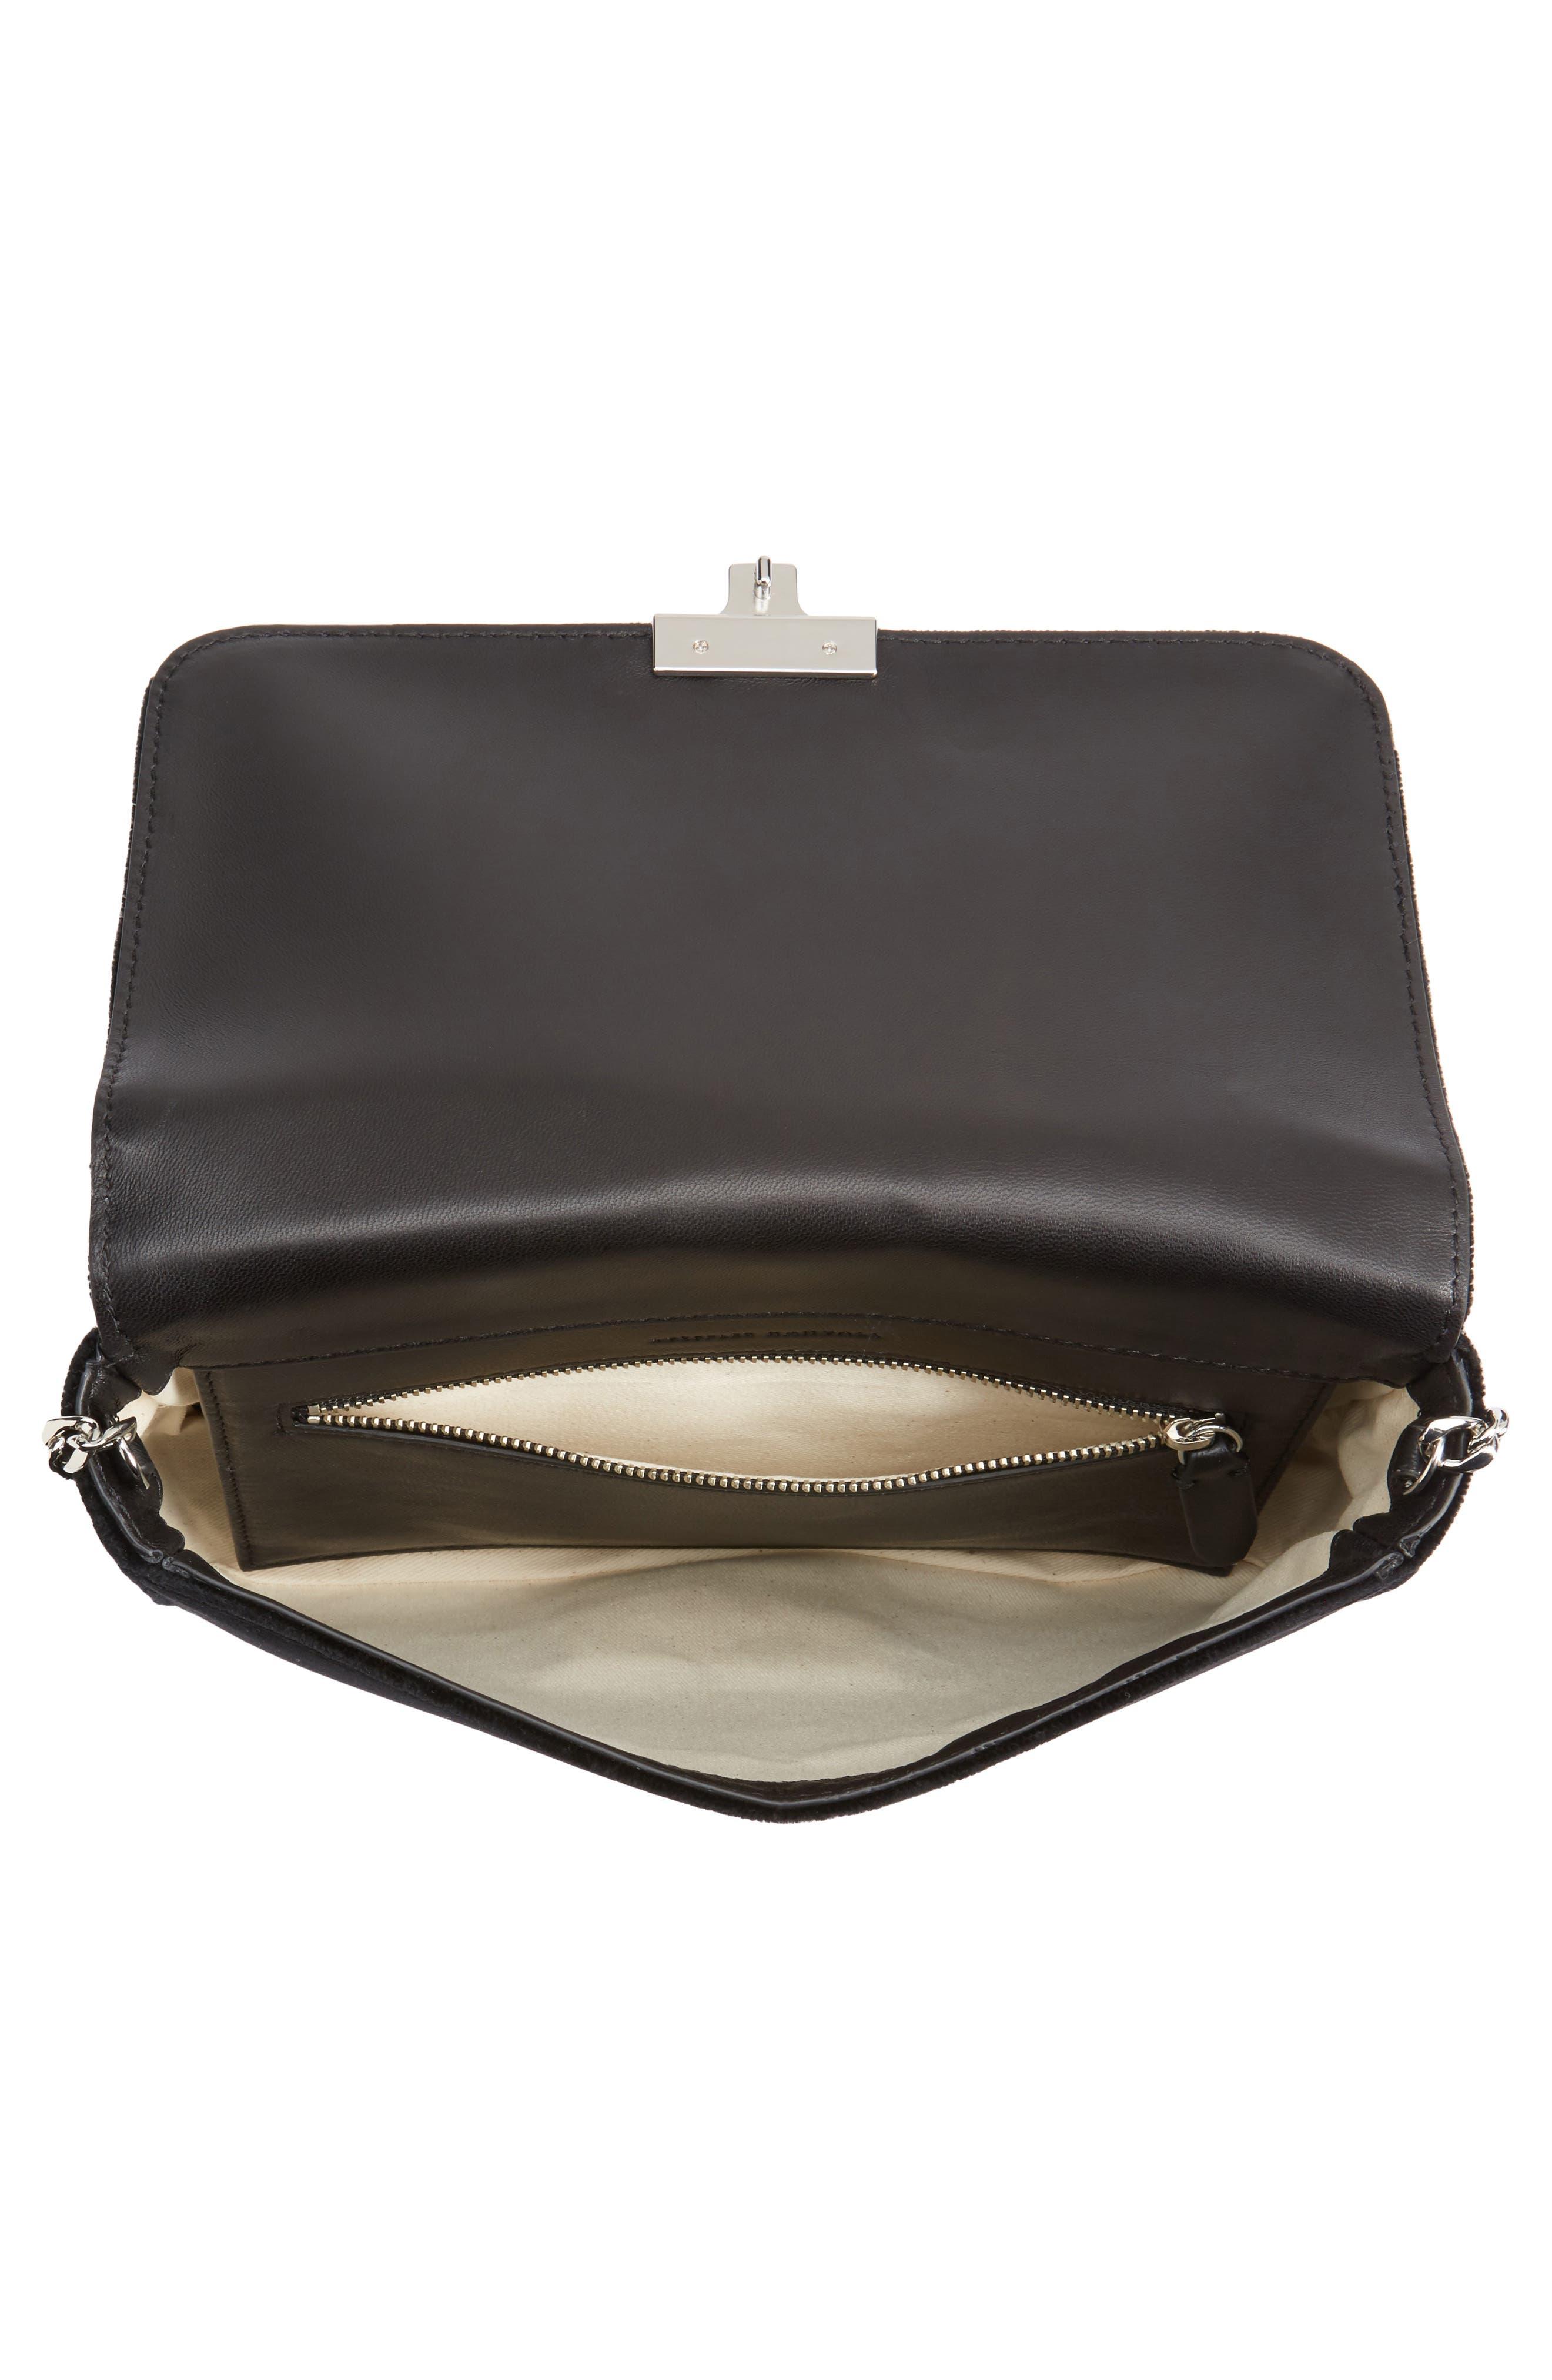 Loeffler Randal Lock Sequin Shoulder Bag,                             Alternate thumbnail 4, color,